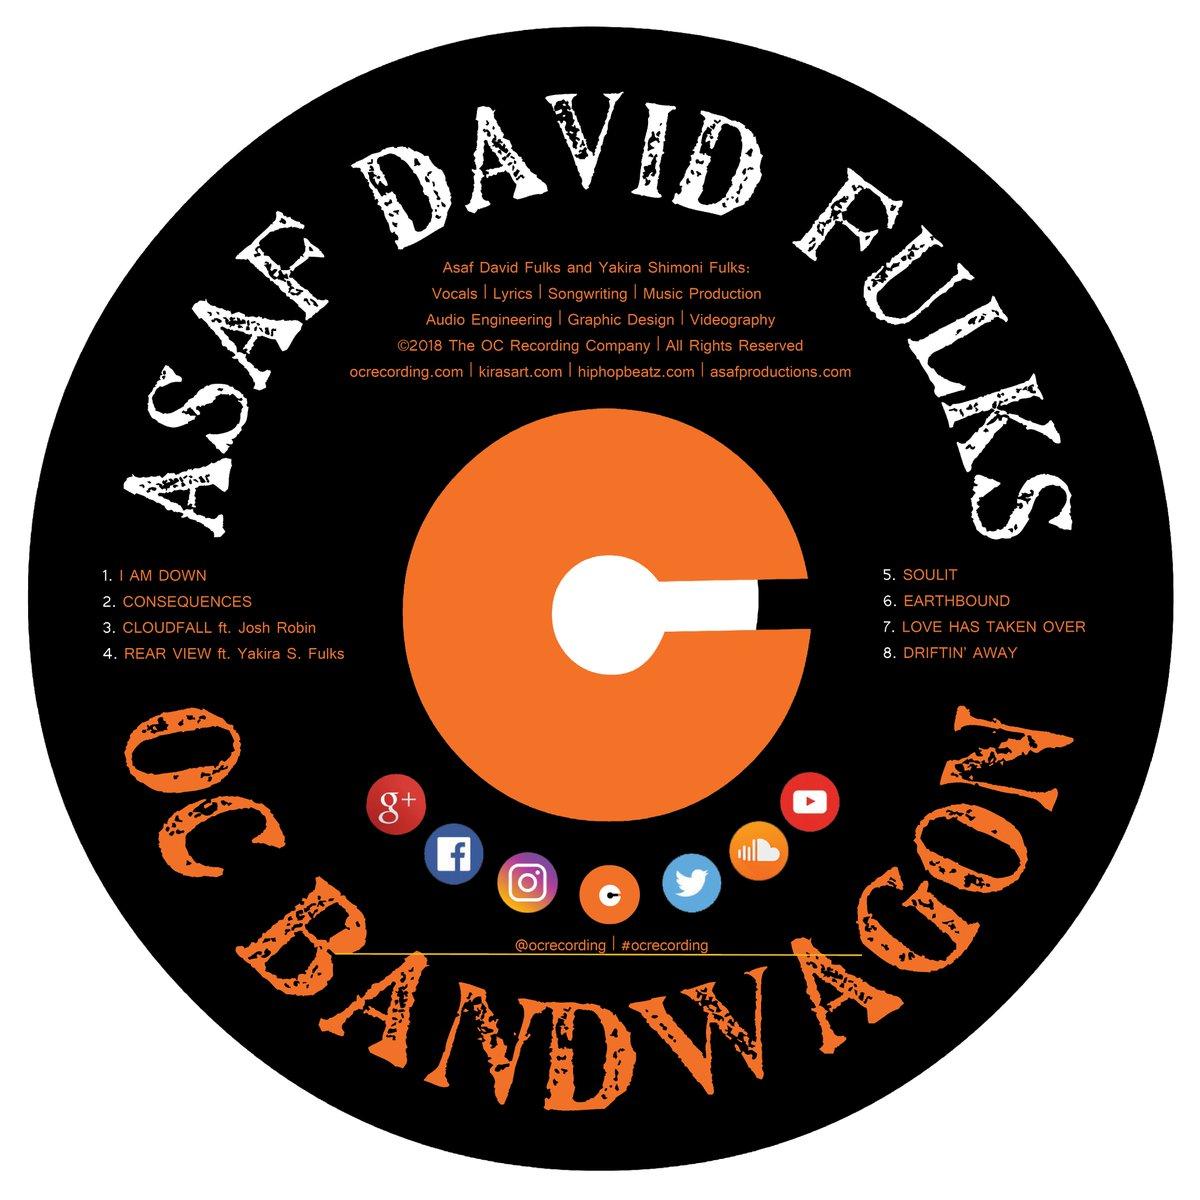 www.pausenspiel.com